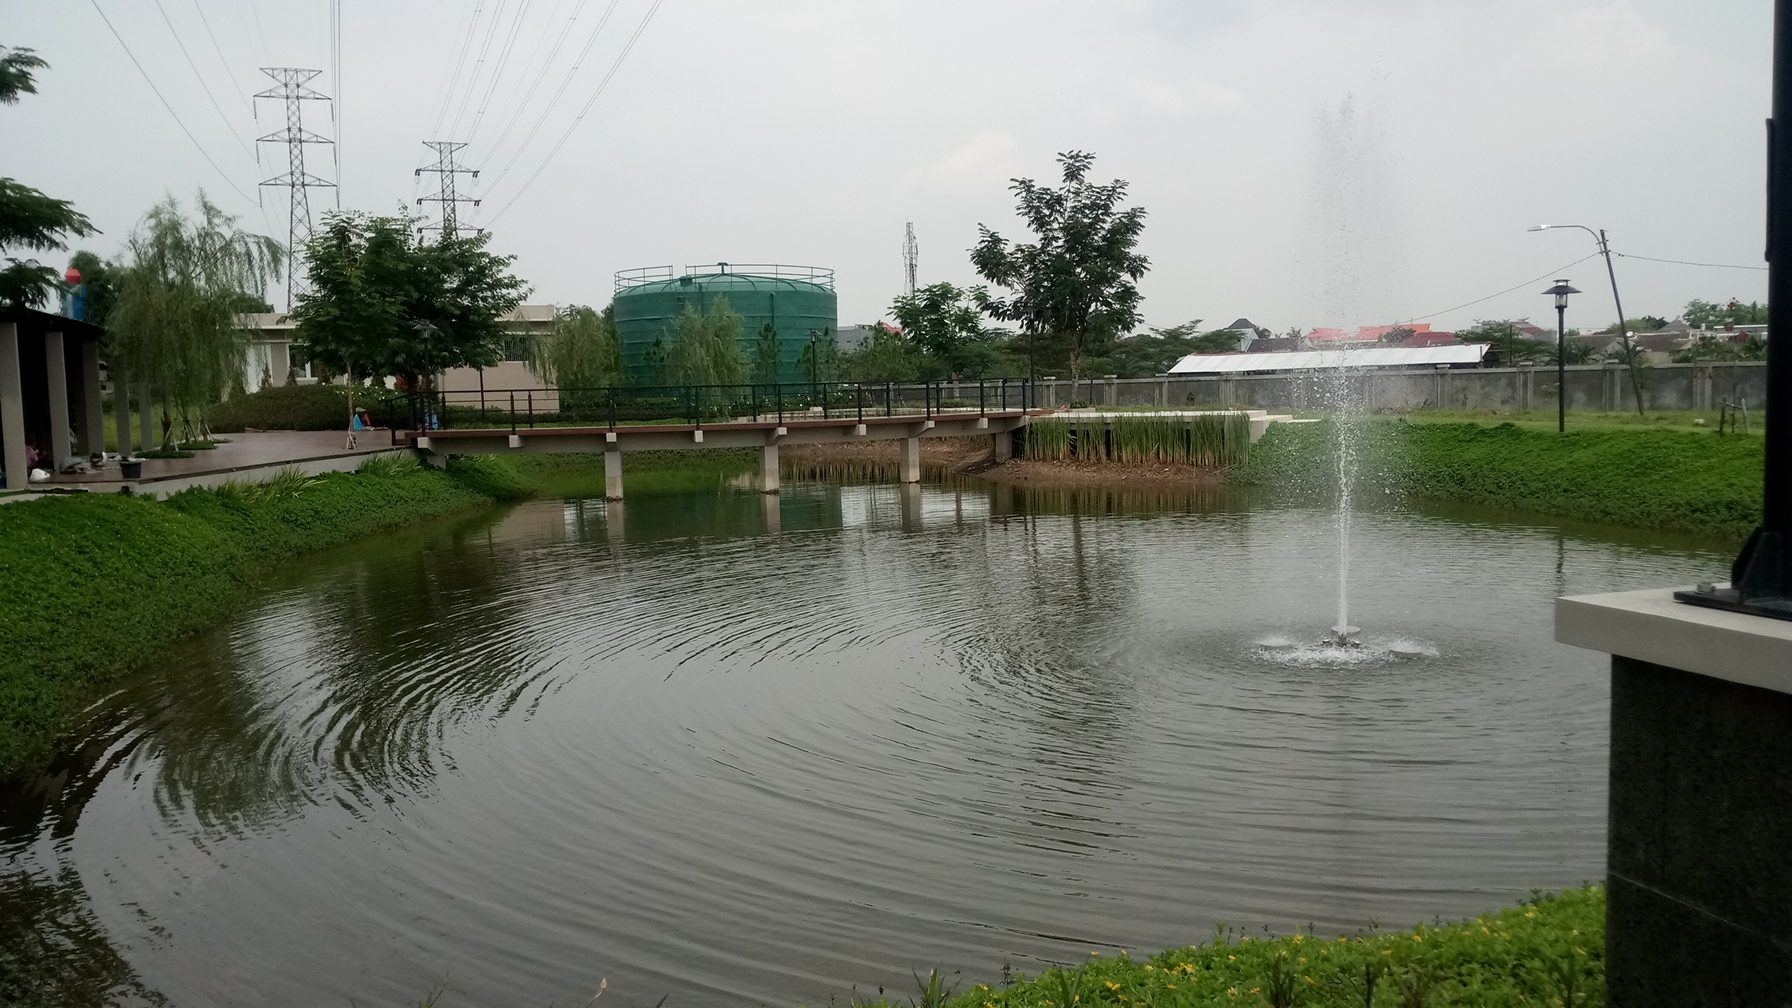 Danau CitraLand The GreenLake